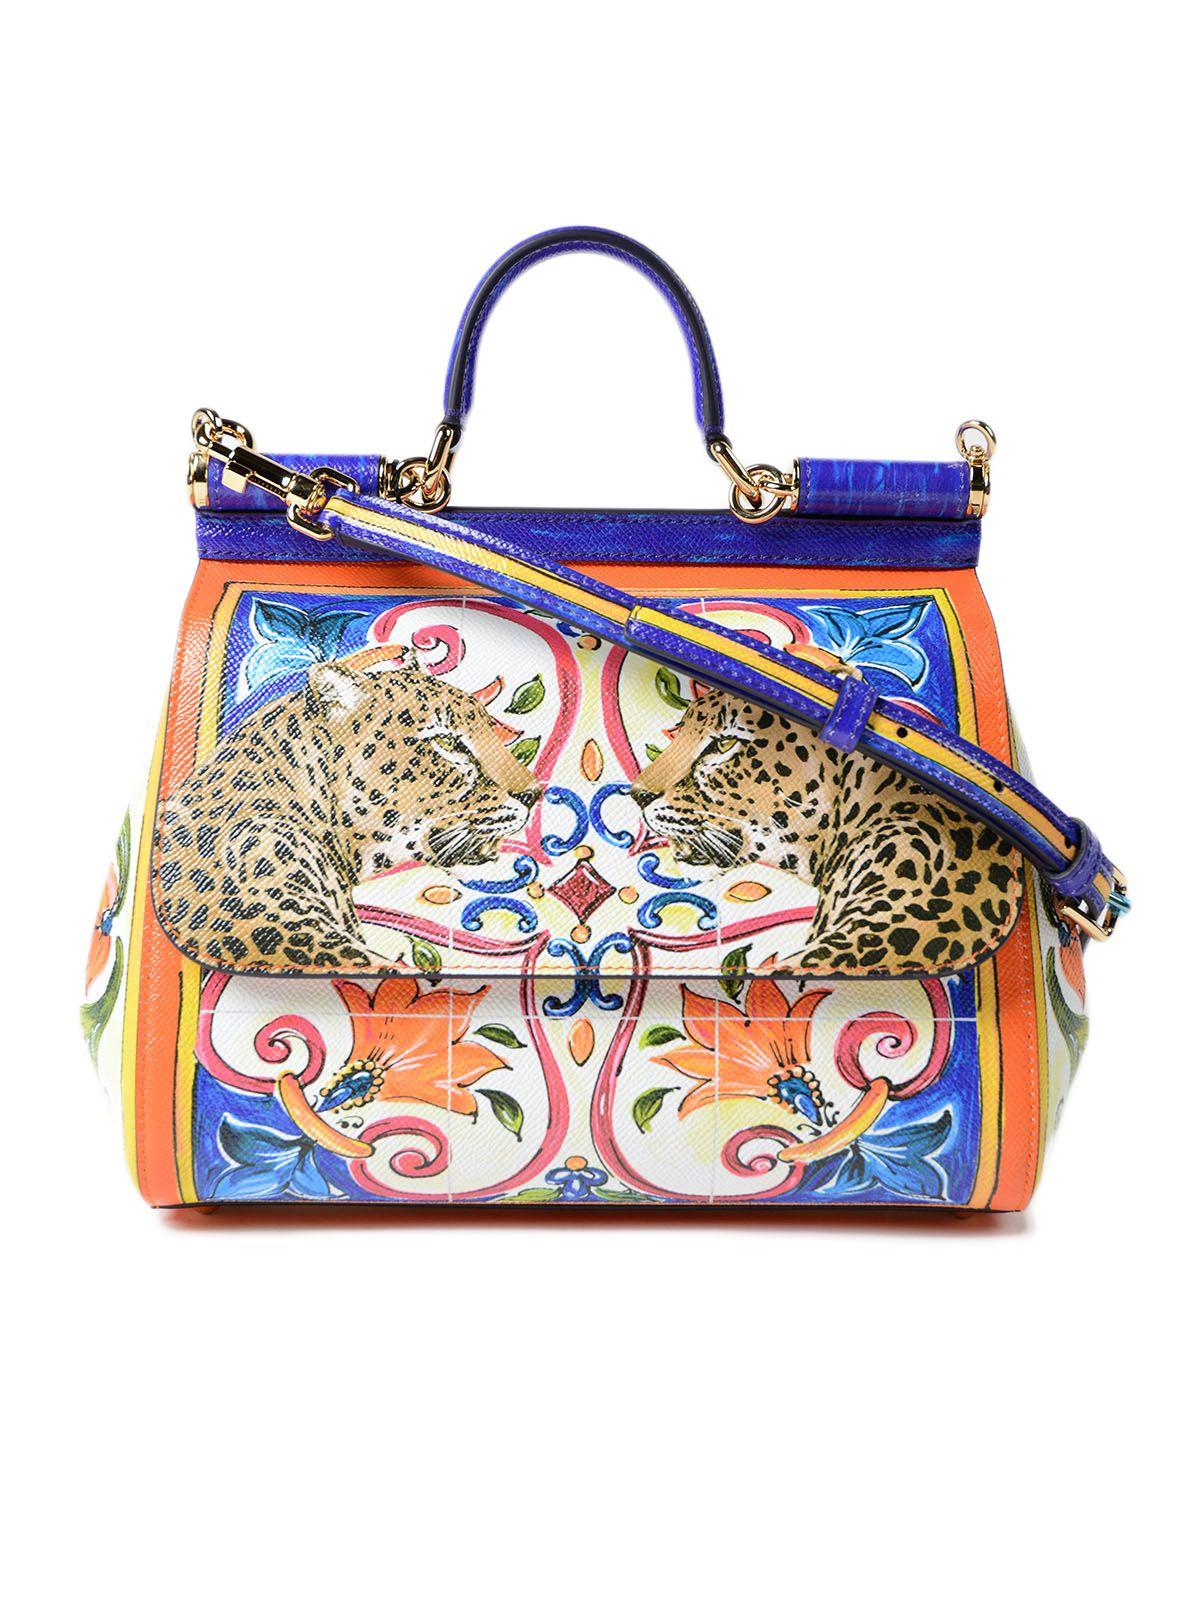 Dolce & Gabbana Dauphine Maiolica Handbag